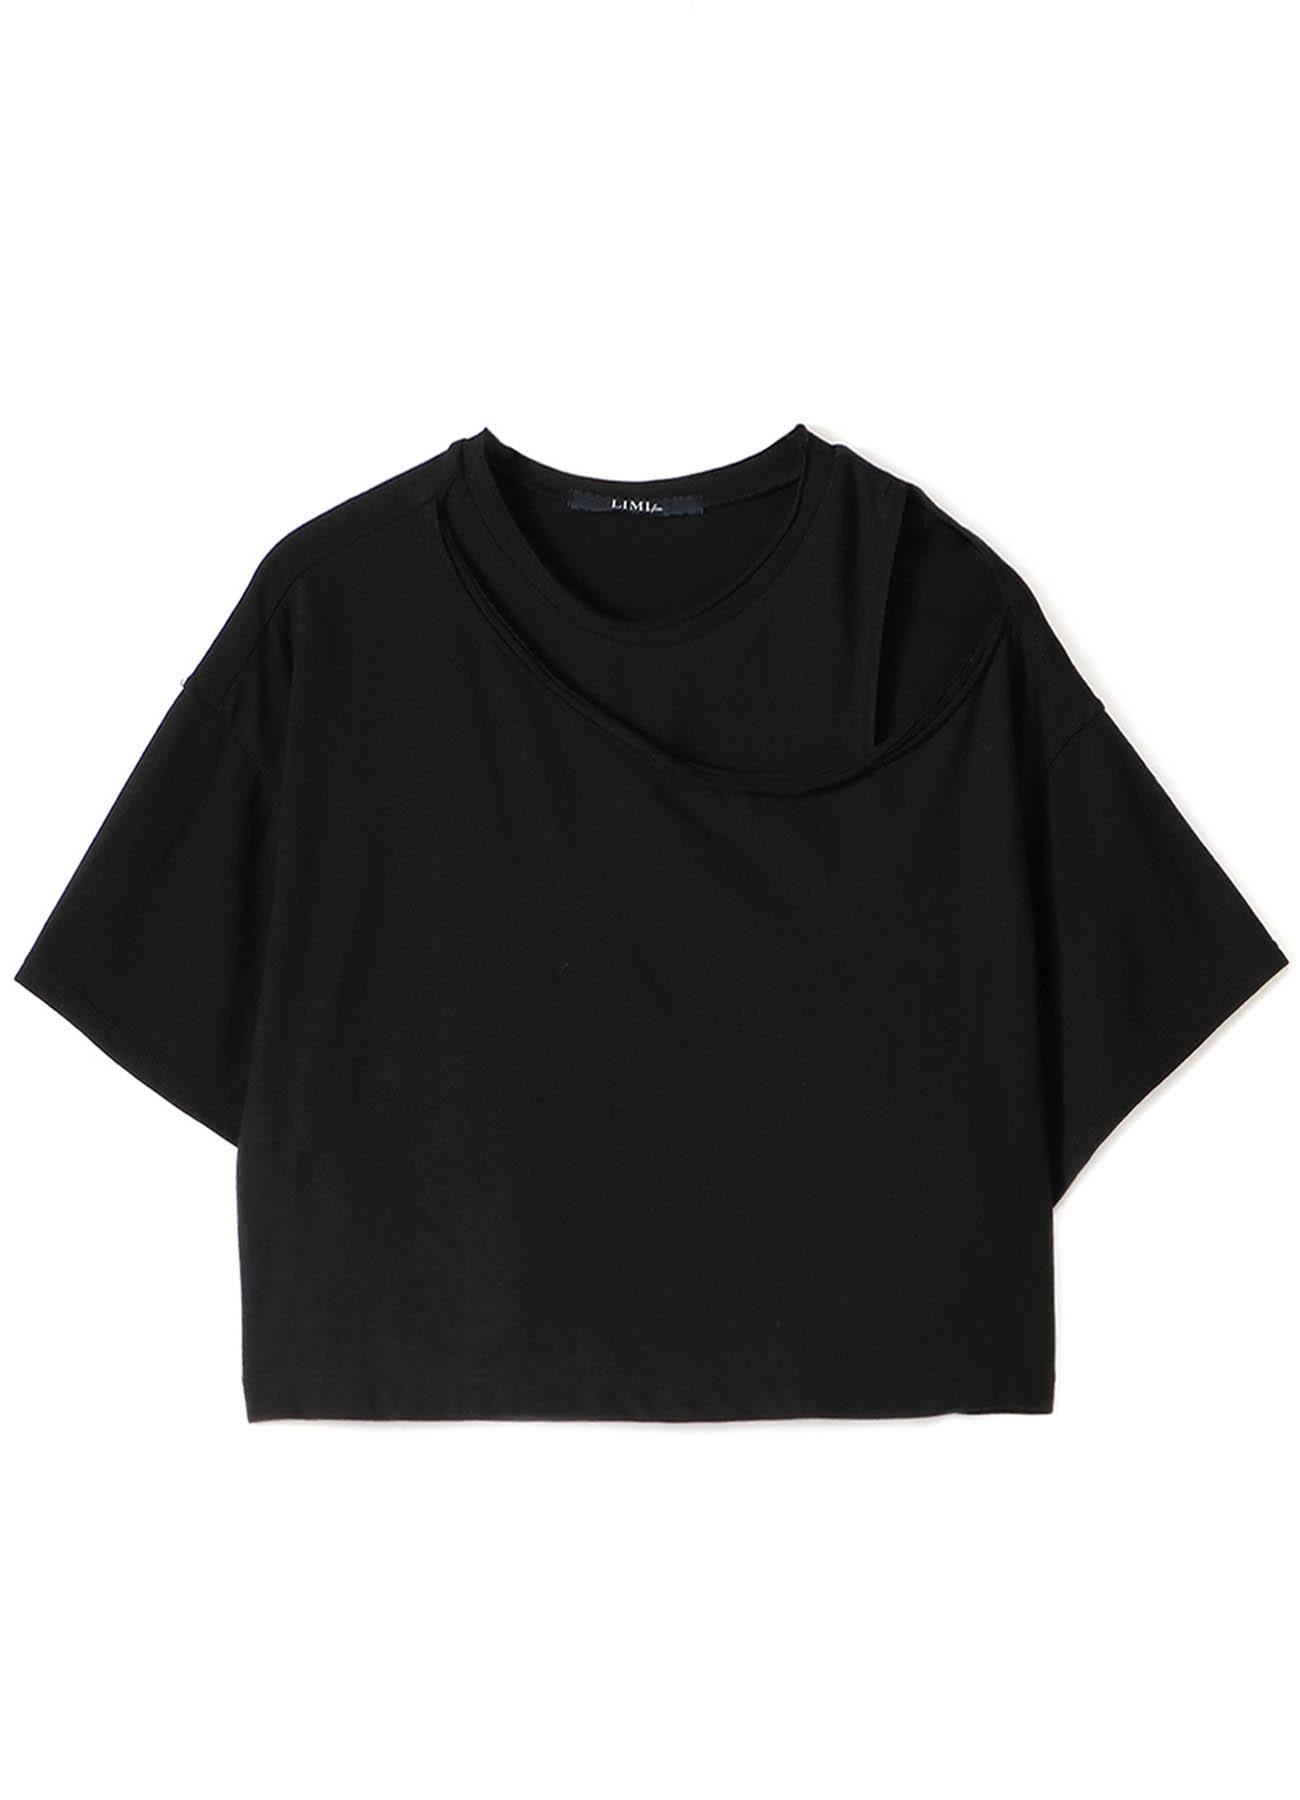 30/-sz Cotton Strong twisted Plain Stitch Layered Short T